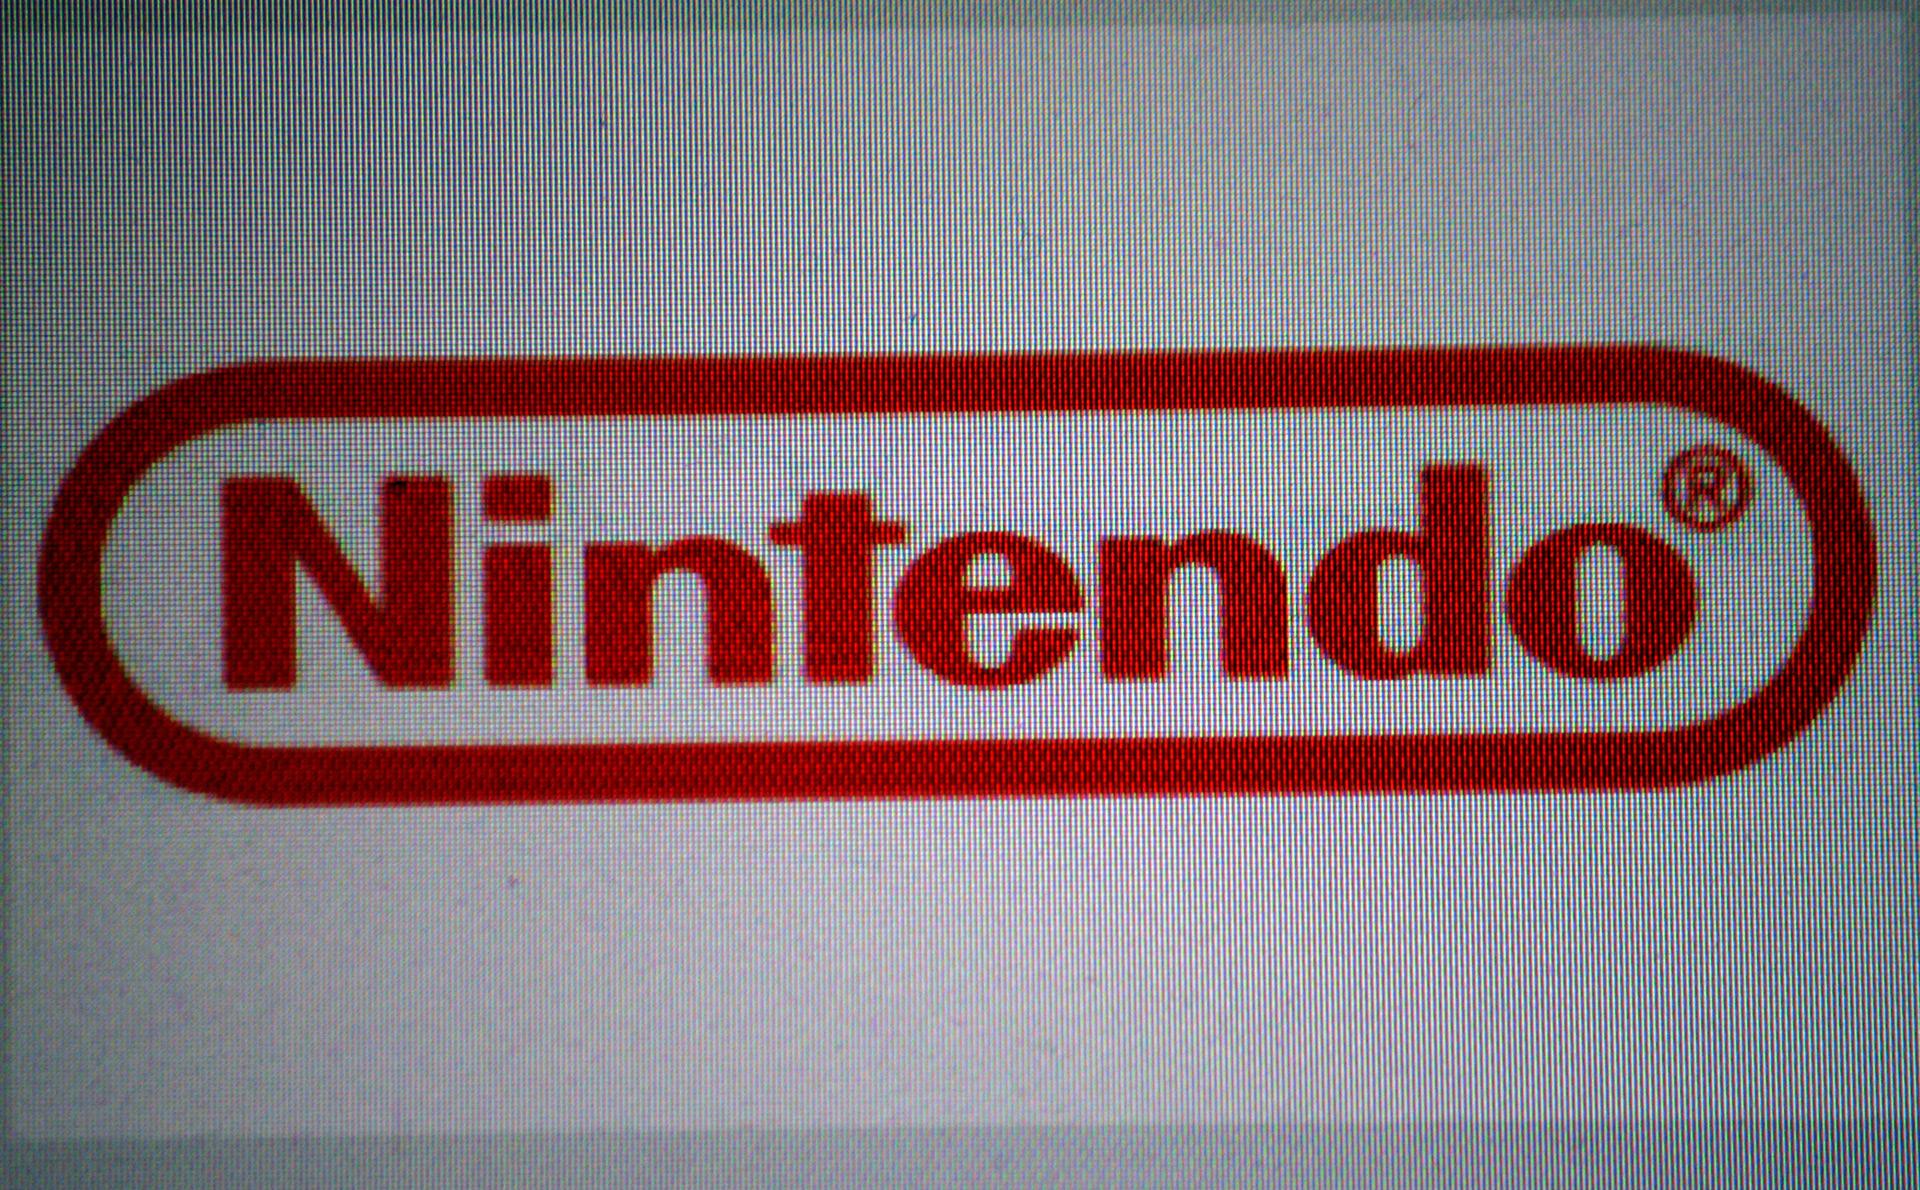 Marca da Nintendo